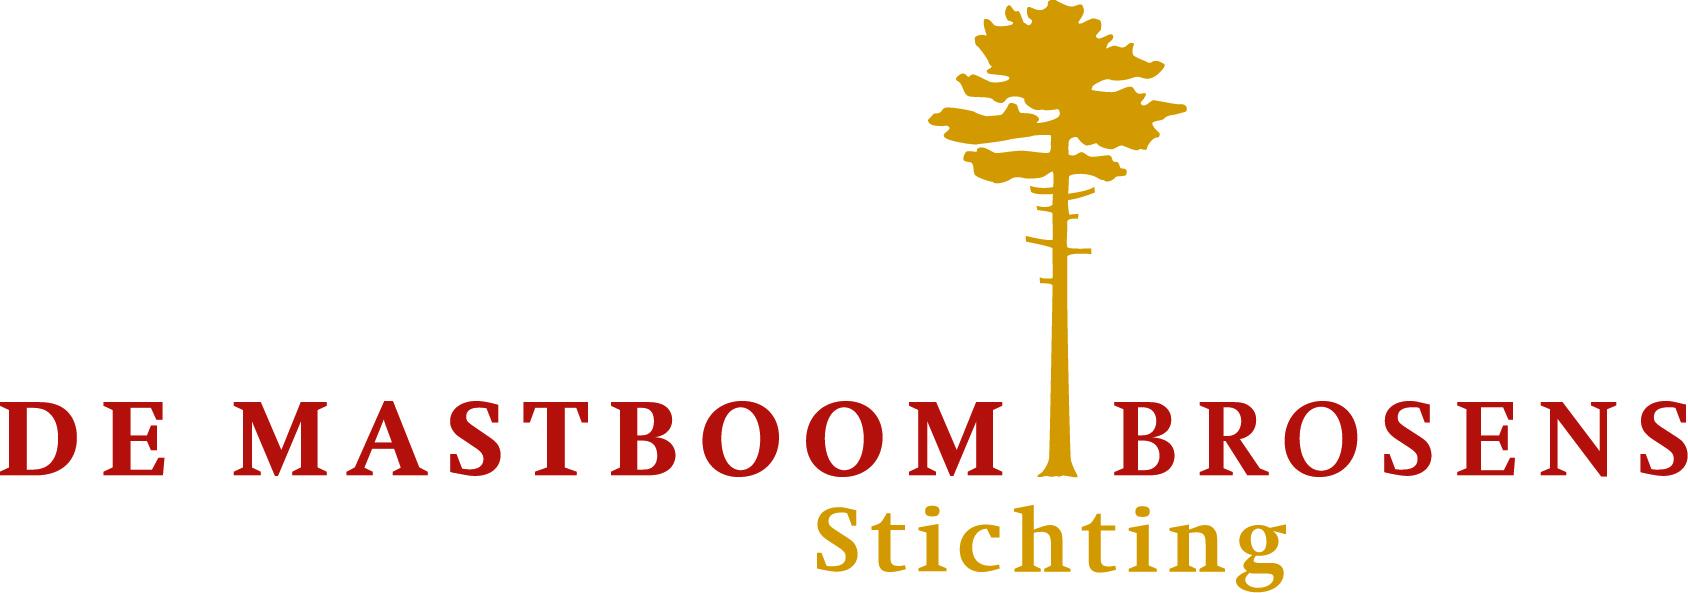 logoMastboomBrosensStichting.jpg